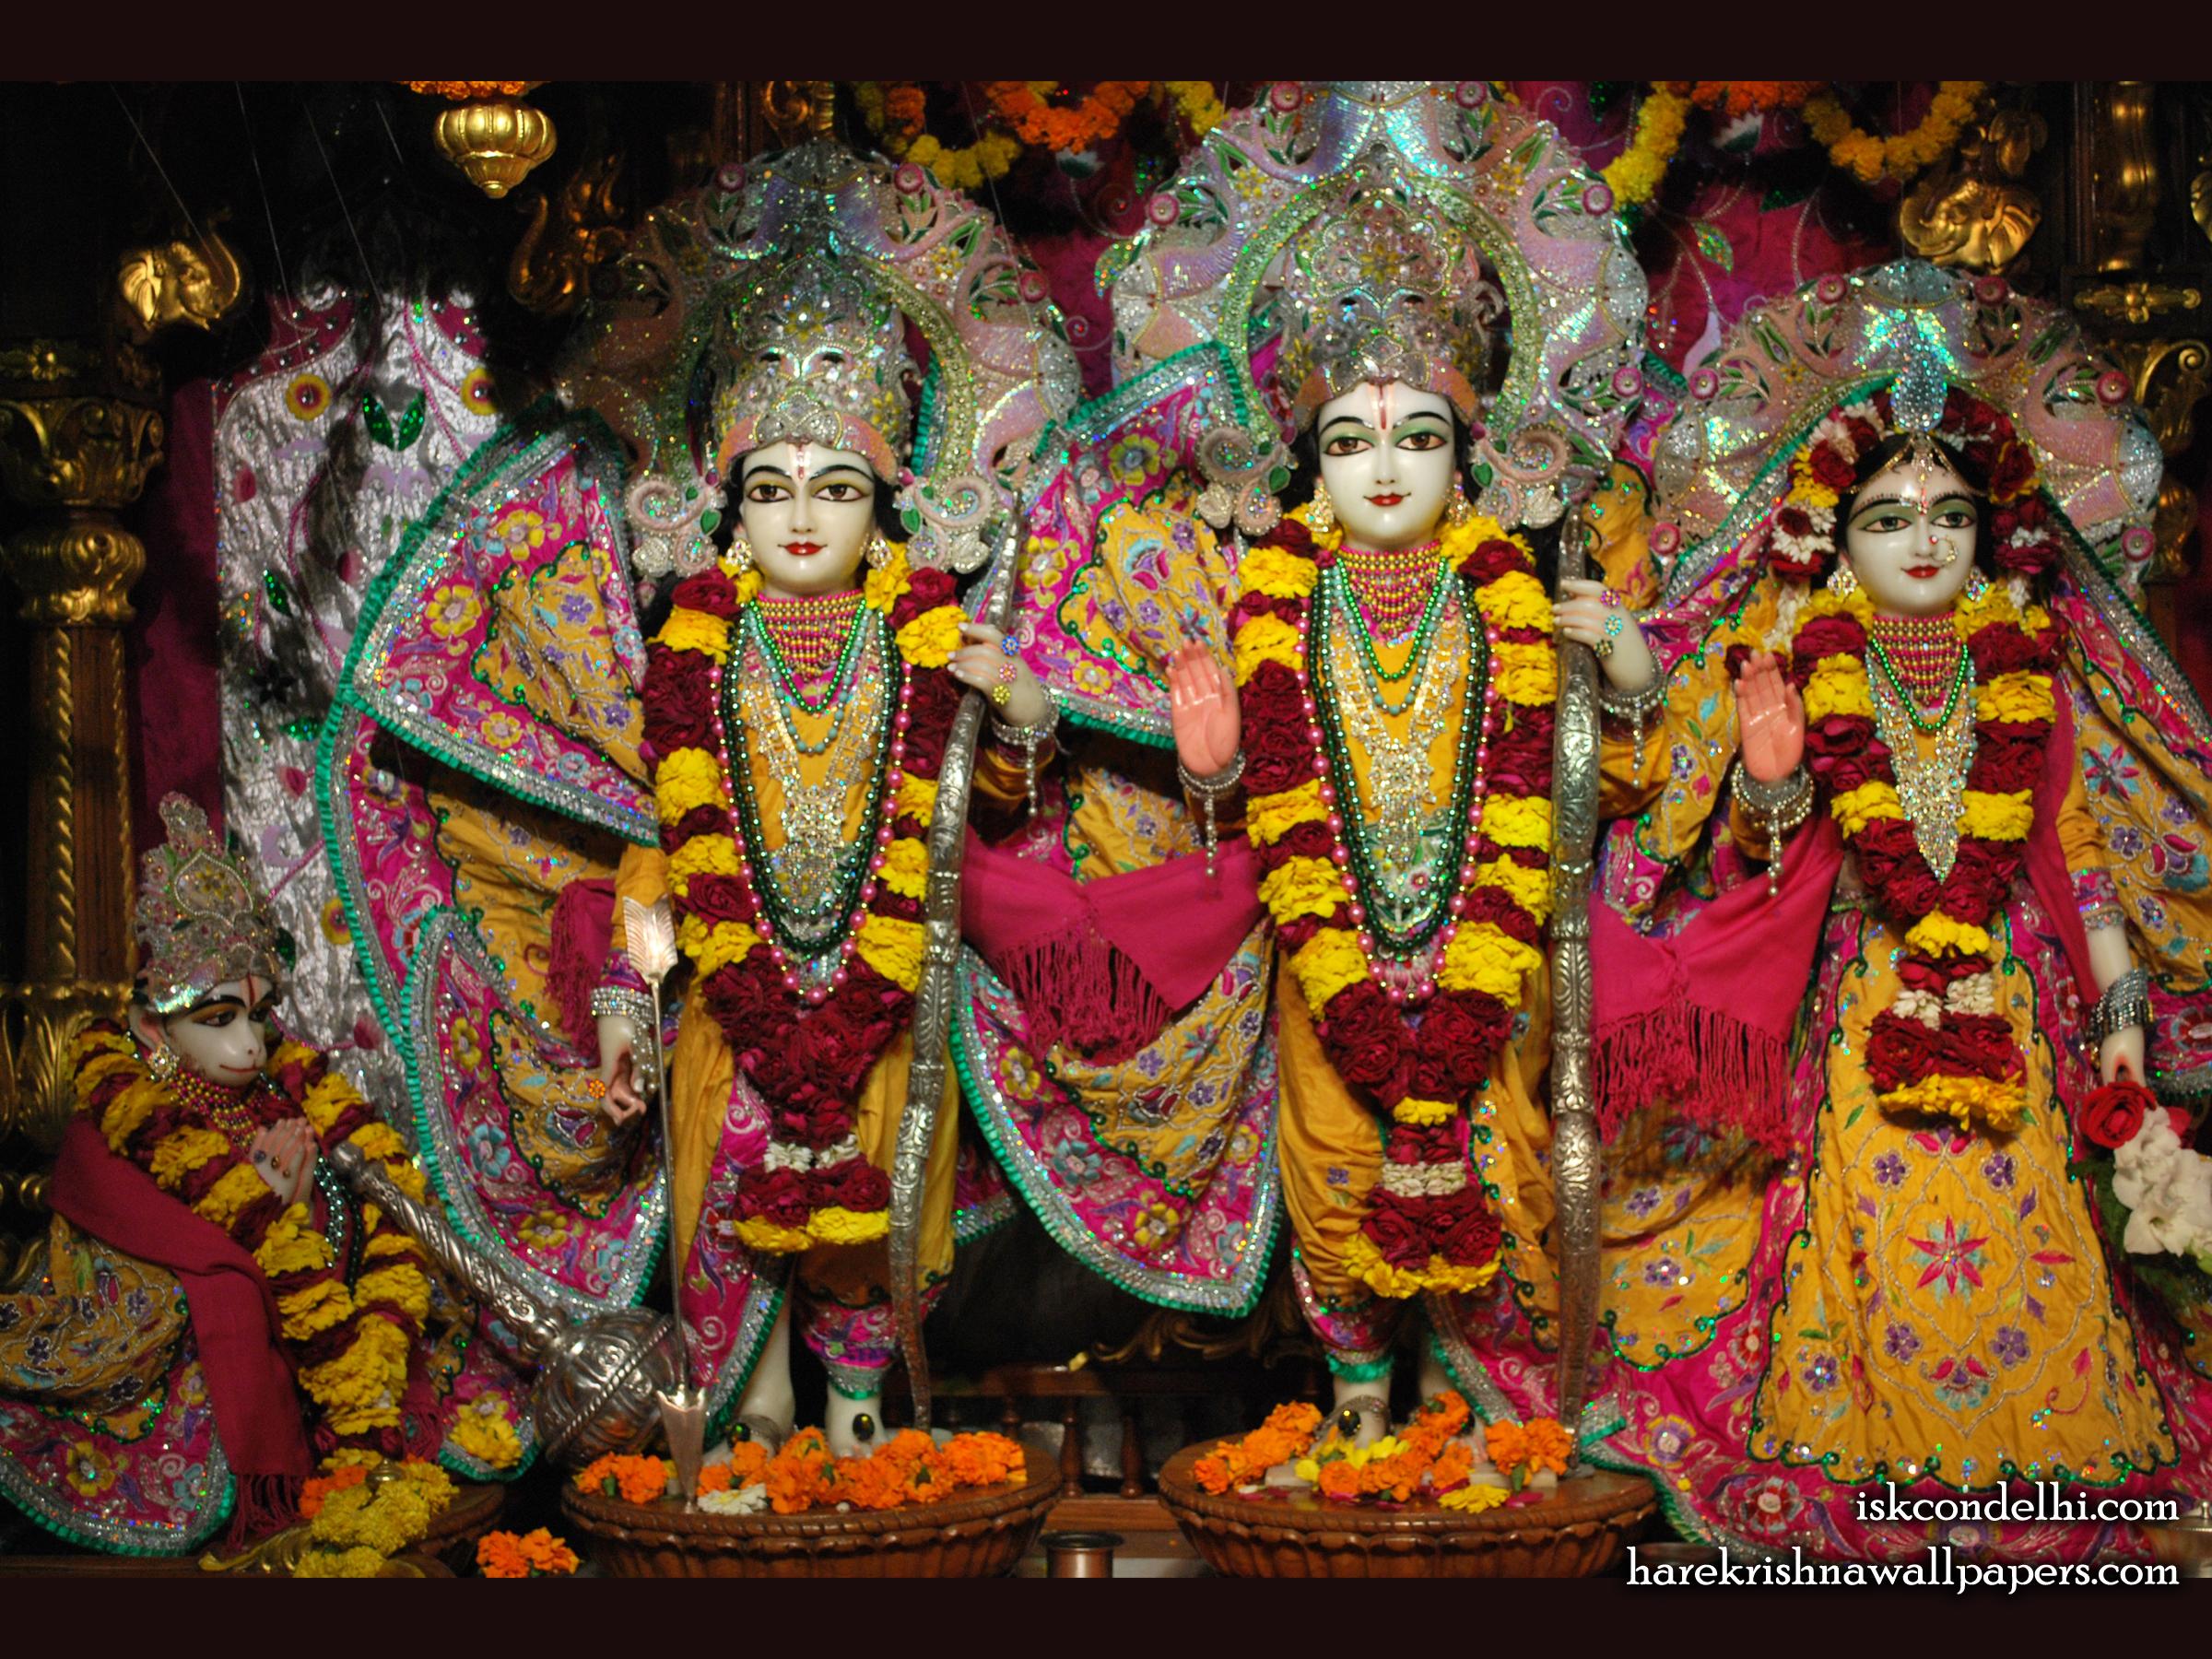 Sri Sri Sita Rama Laxman Hanuman Wallpaper (002) Size 2400x1800 Download